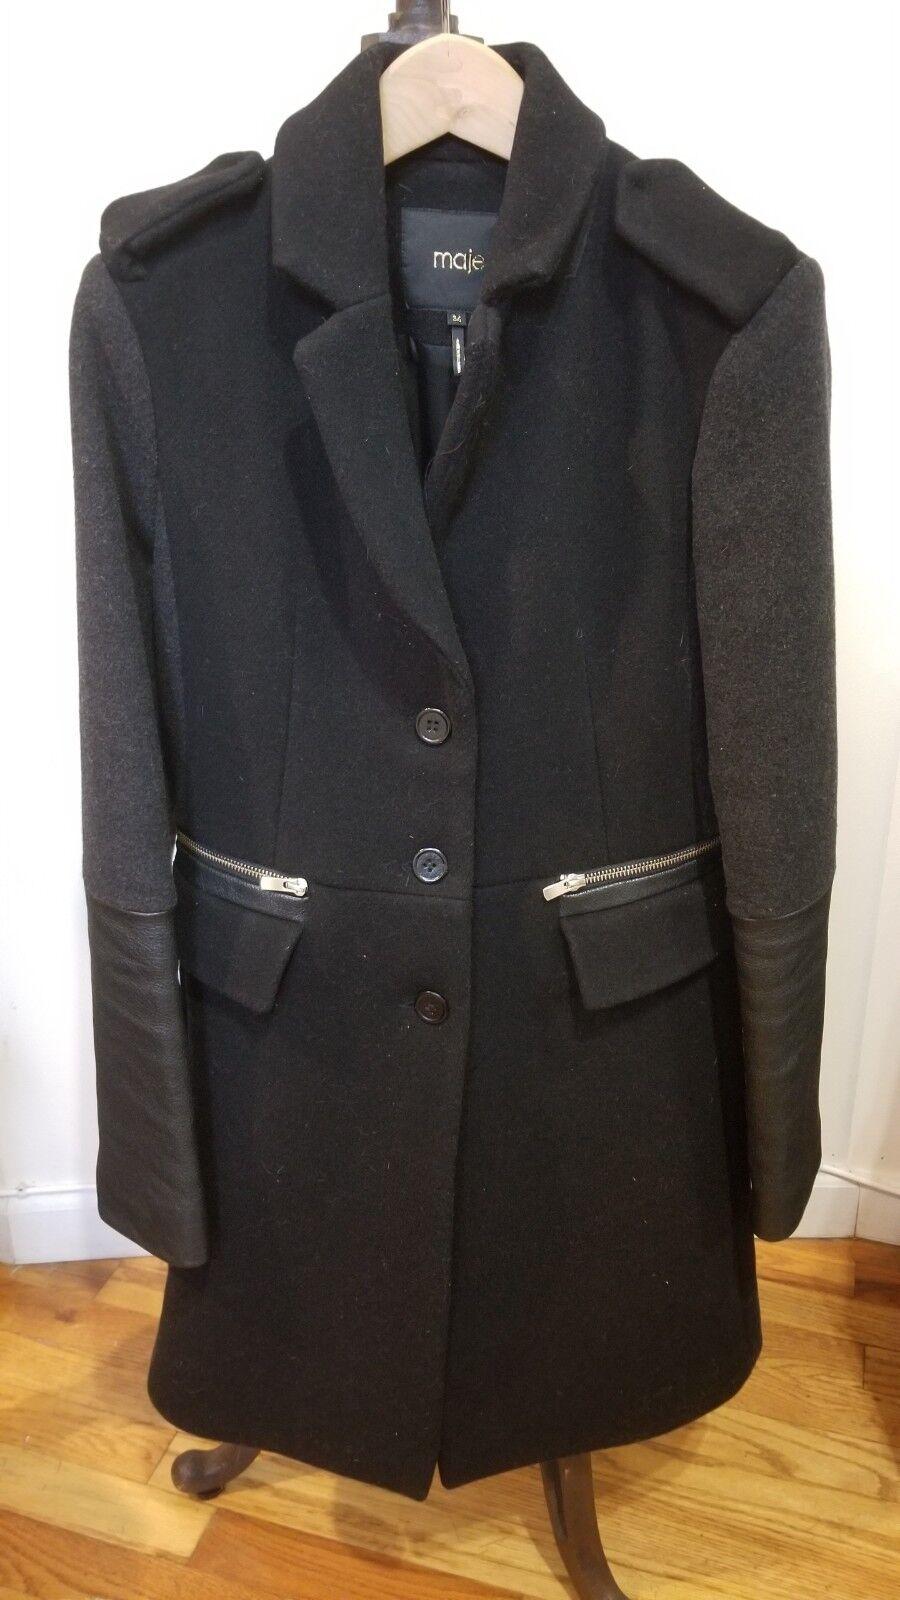 Maje Wool Coat, Size 36